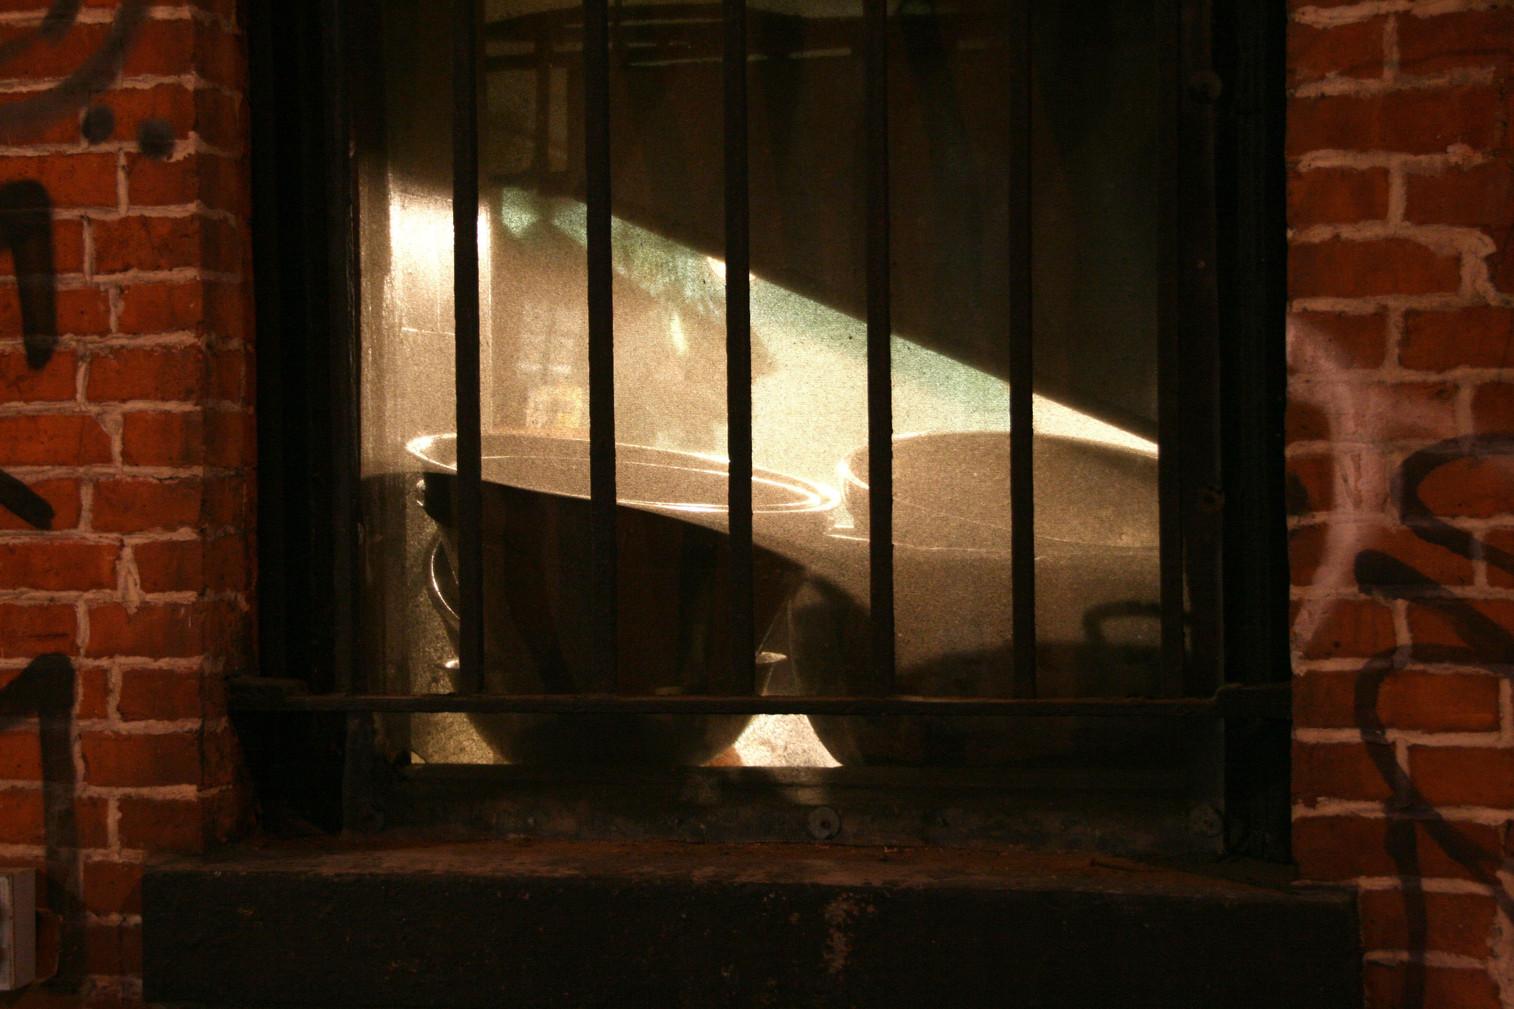 17_New York Polyphony, 2008, Fotografie,